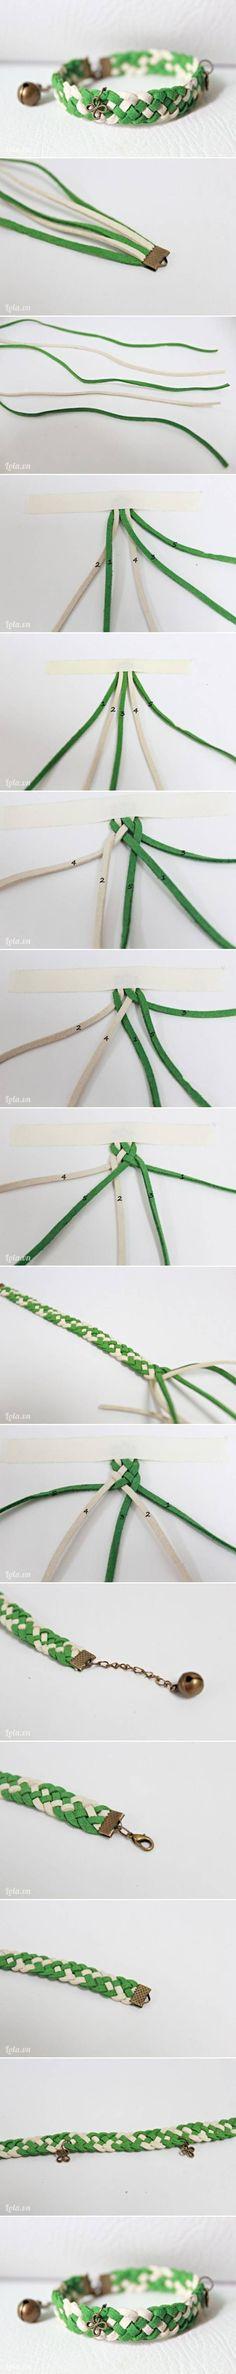 DIY bracelet | www.bykaro.nl for your jewelry making supplies